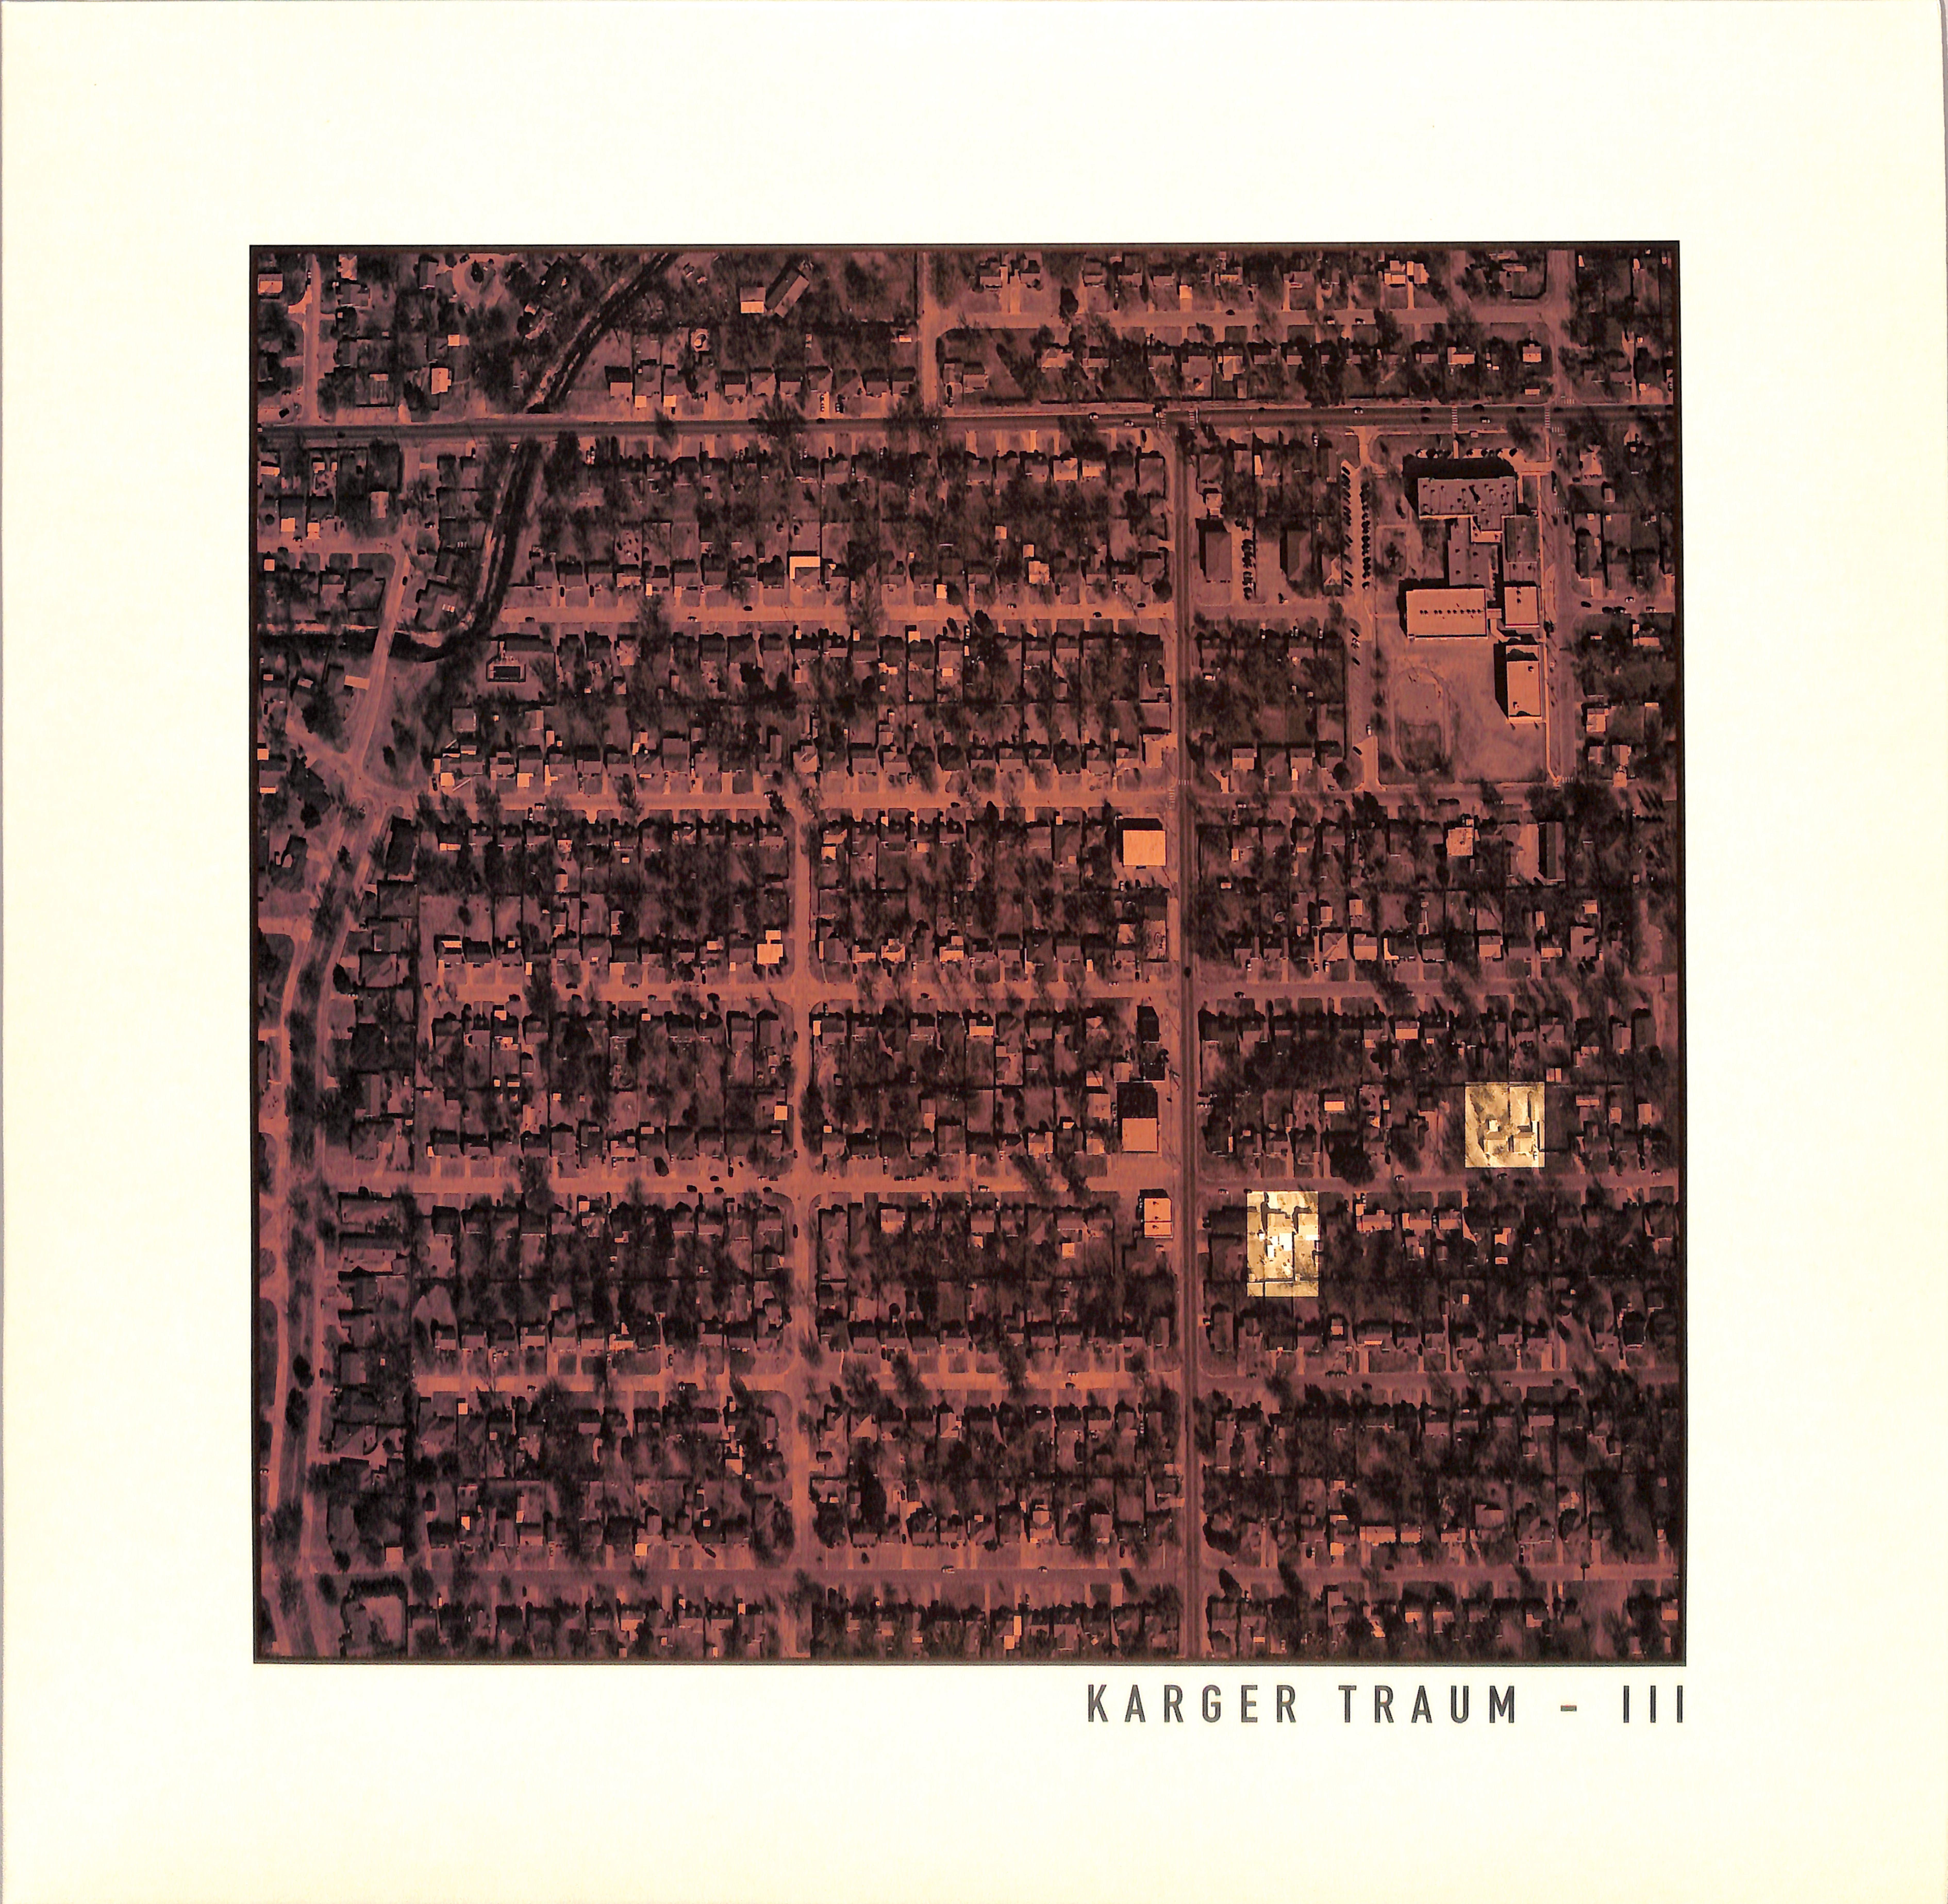 Karger Traum - III